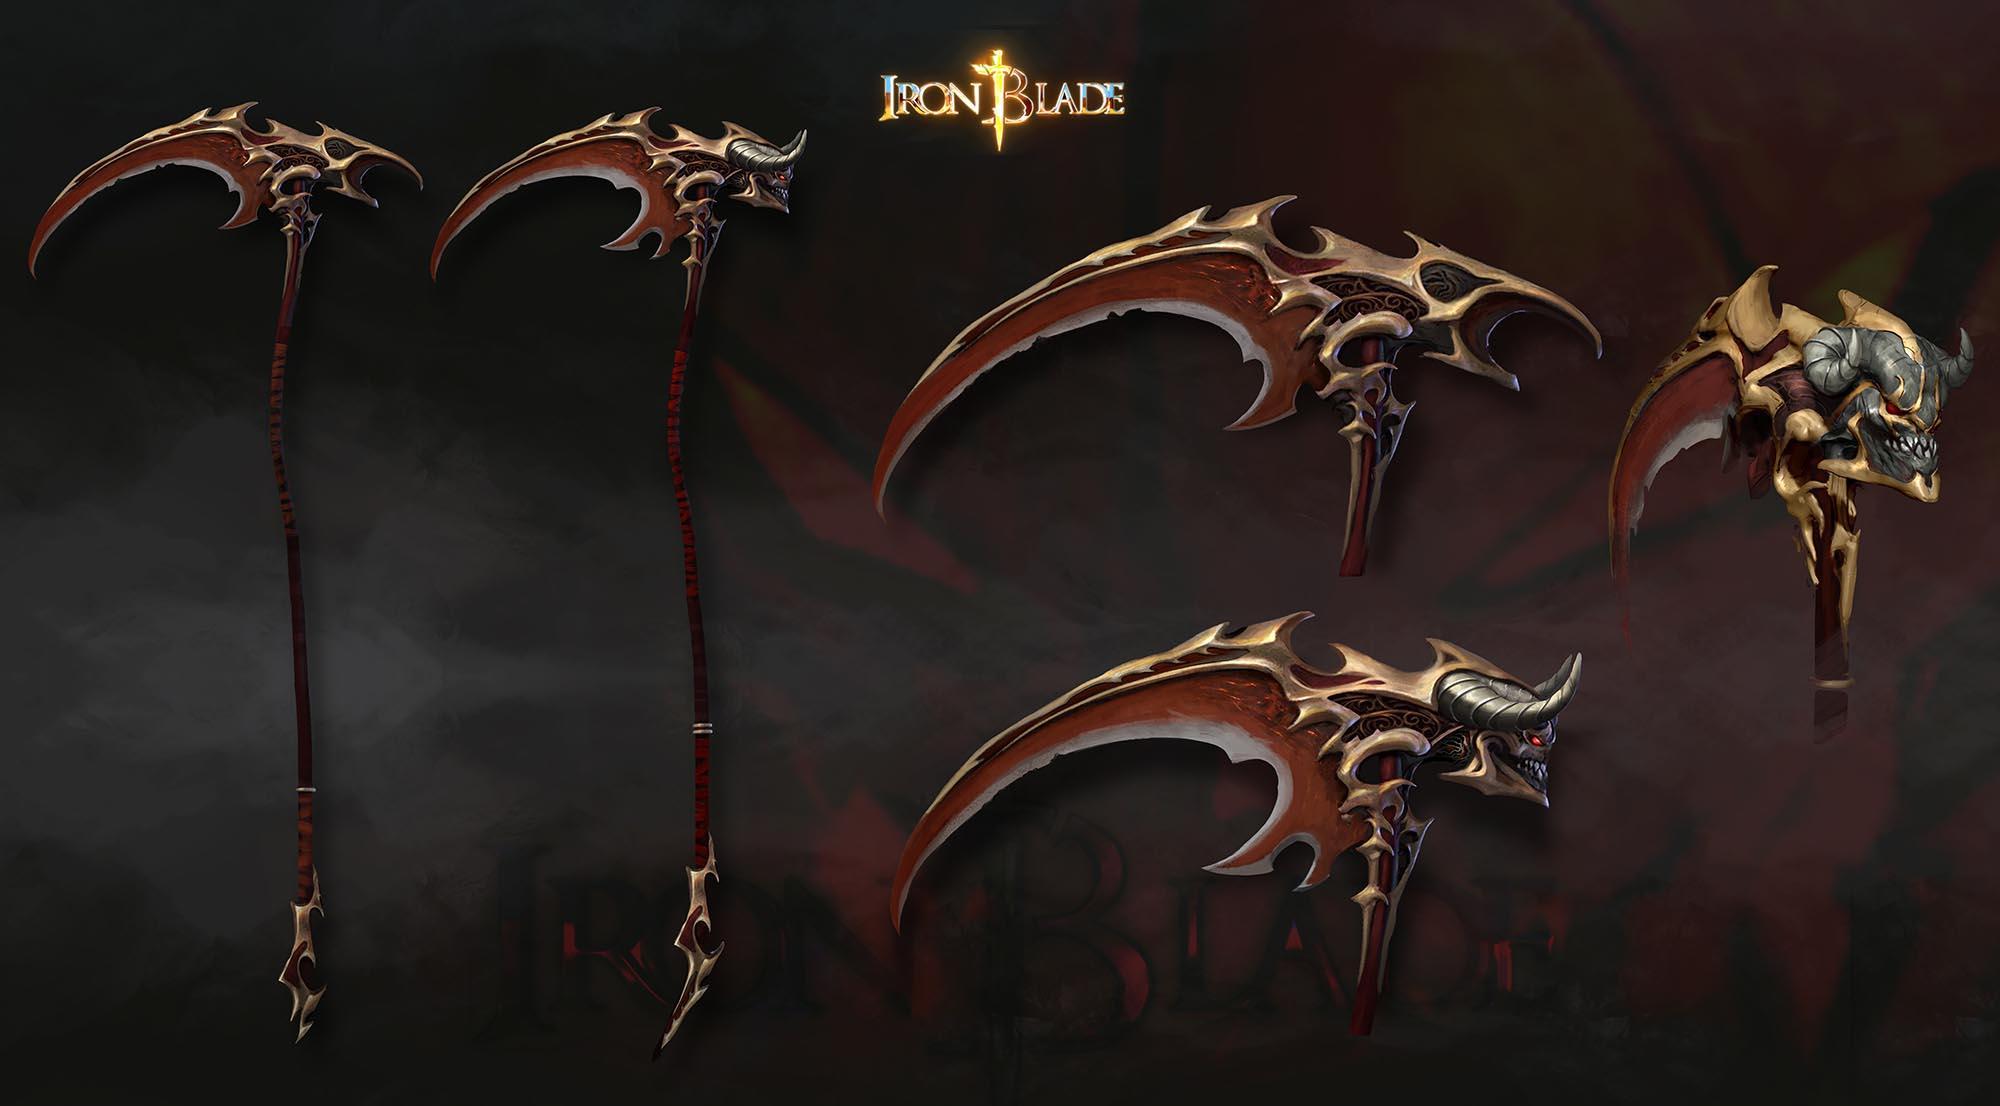 Scythe Concept by Darkcloud013